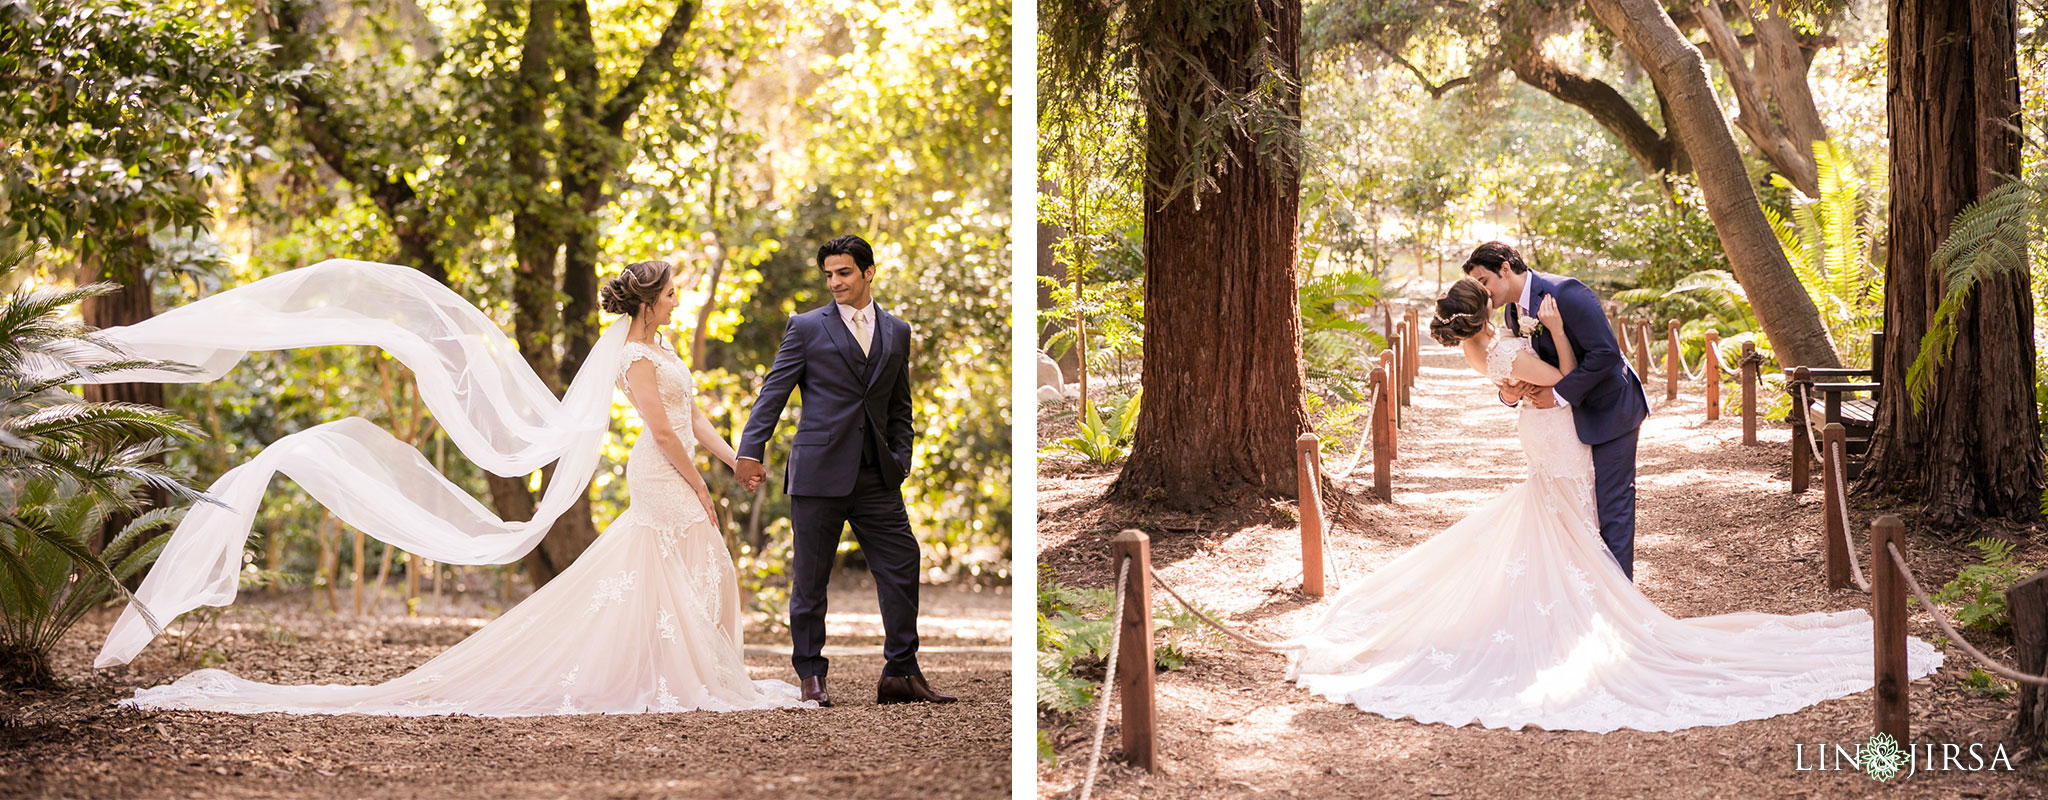 012 taglyan complex los angeles persian wedding photography